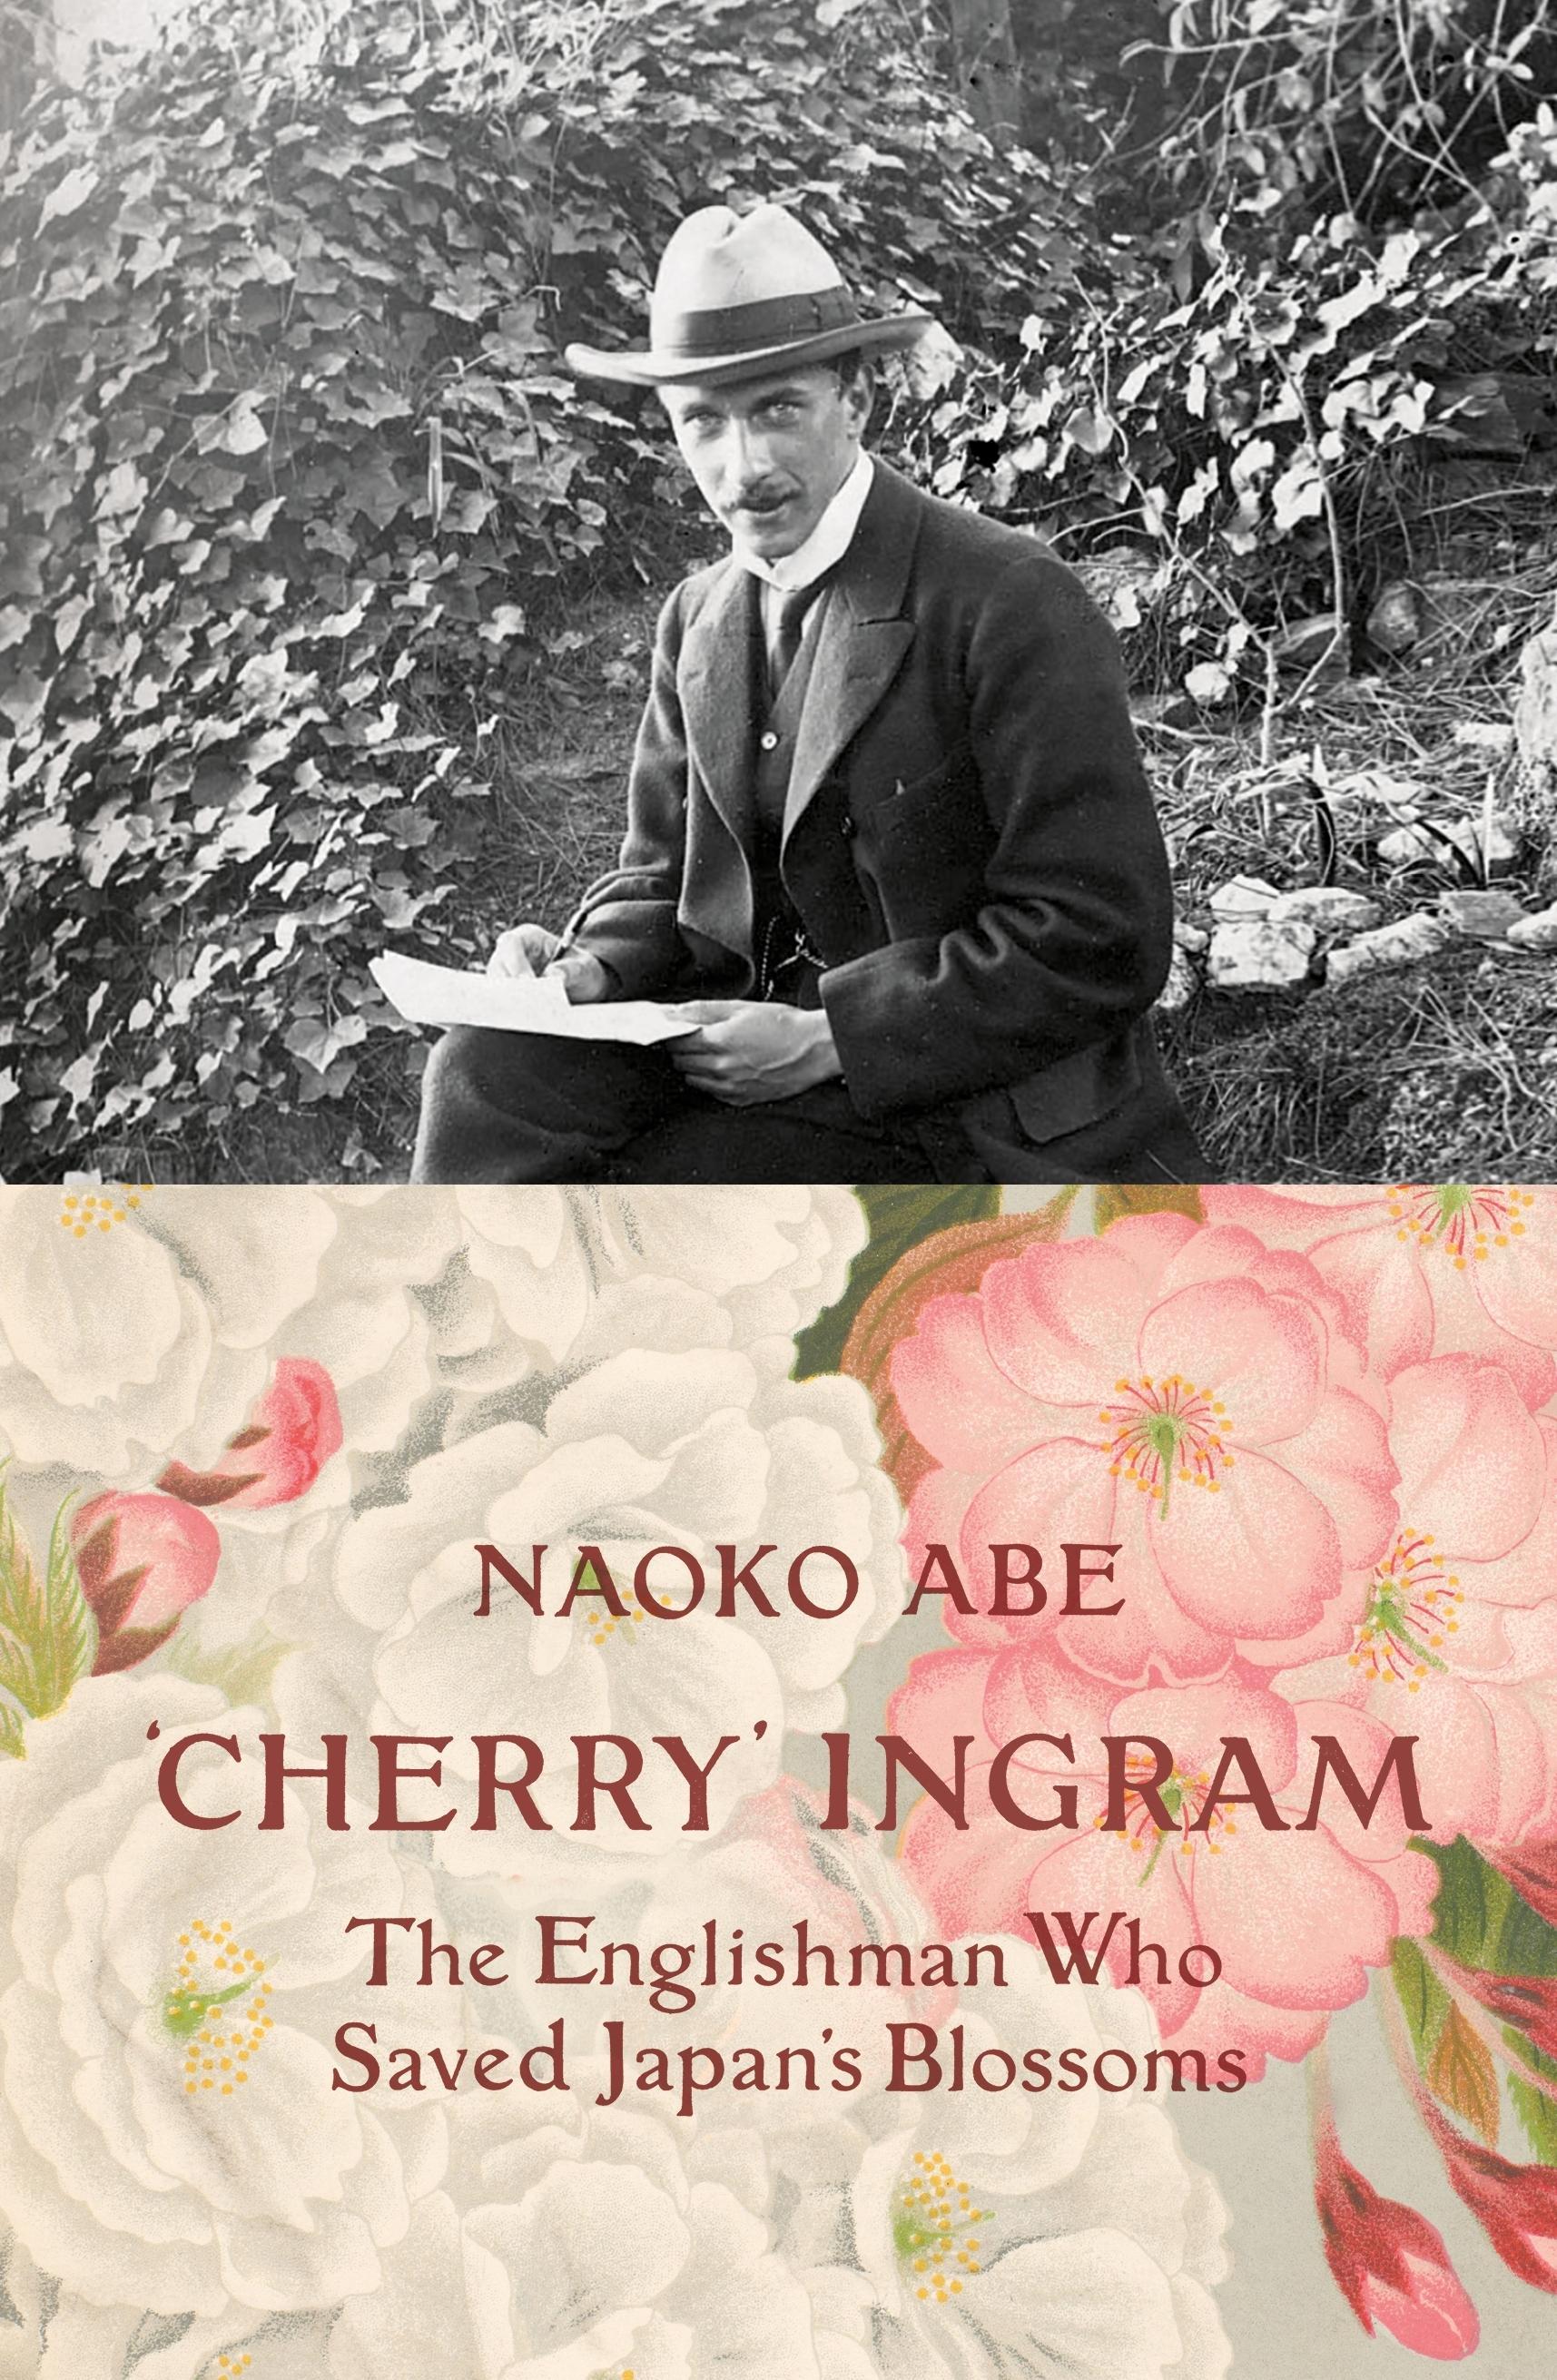 'Cherry'Ingram